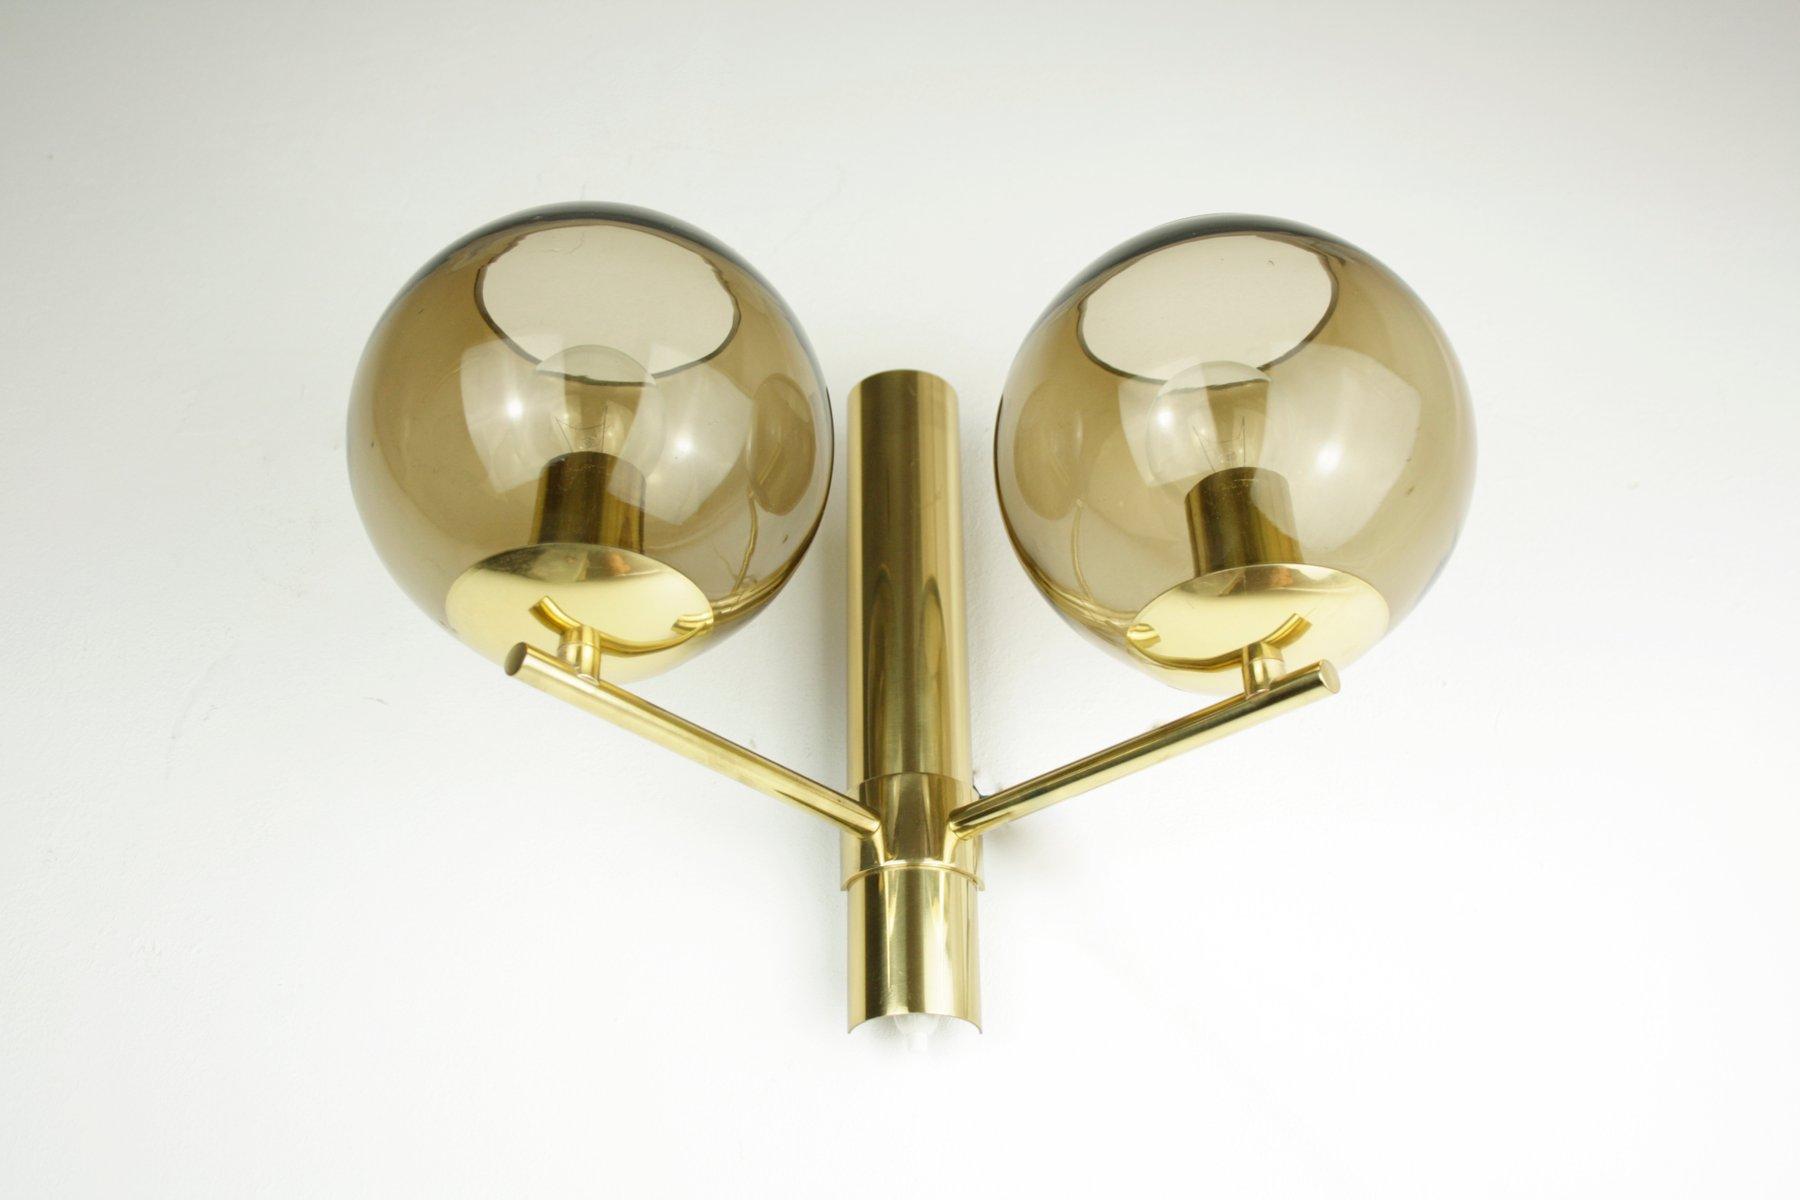 Zweiflammige schwedische Mid-Century Wandlampe, 1960er